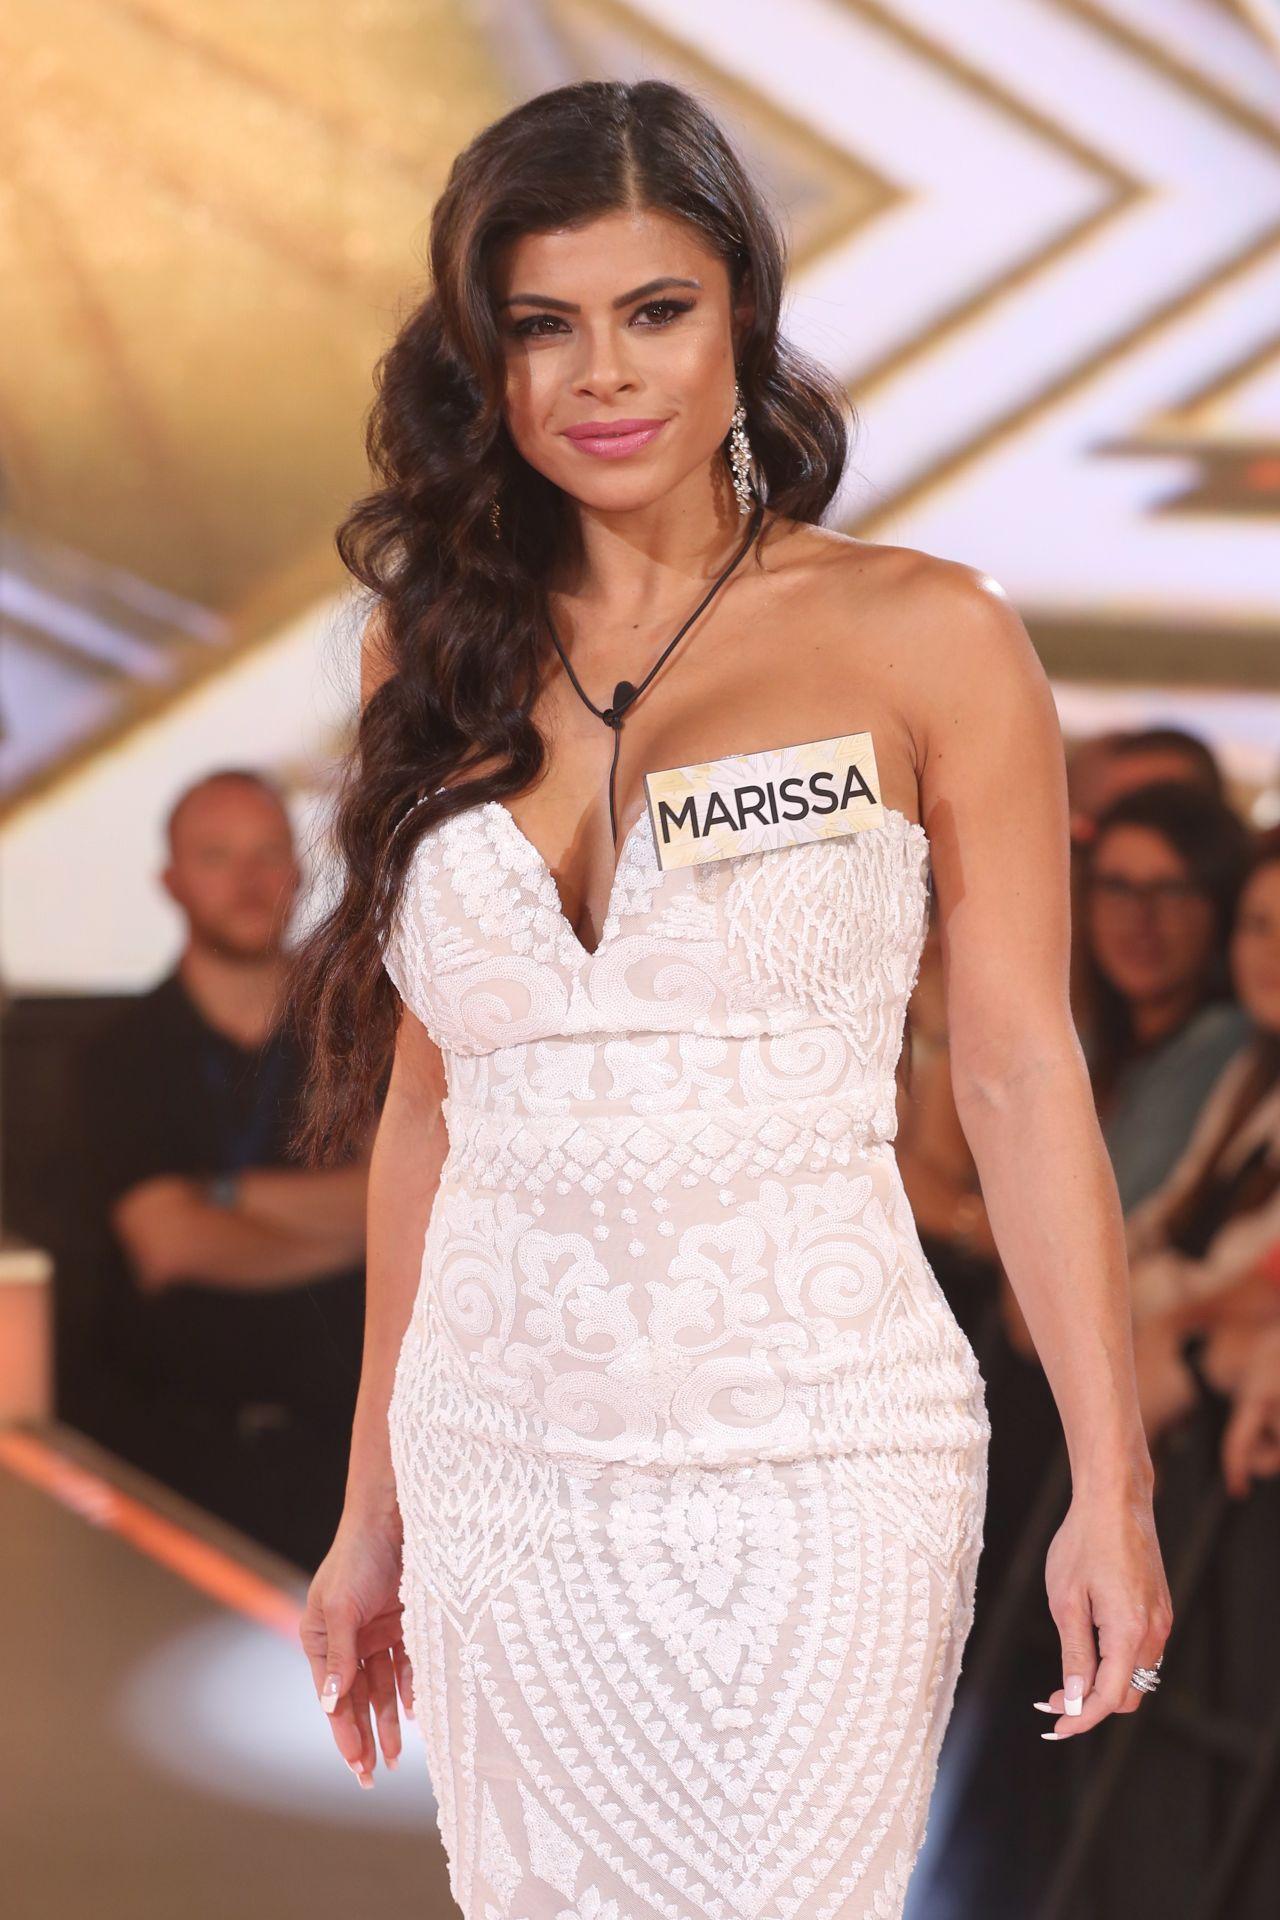 Celebrity Big Brother (UK TV series) - Wikipedia